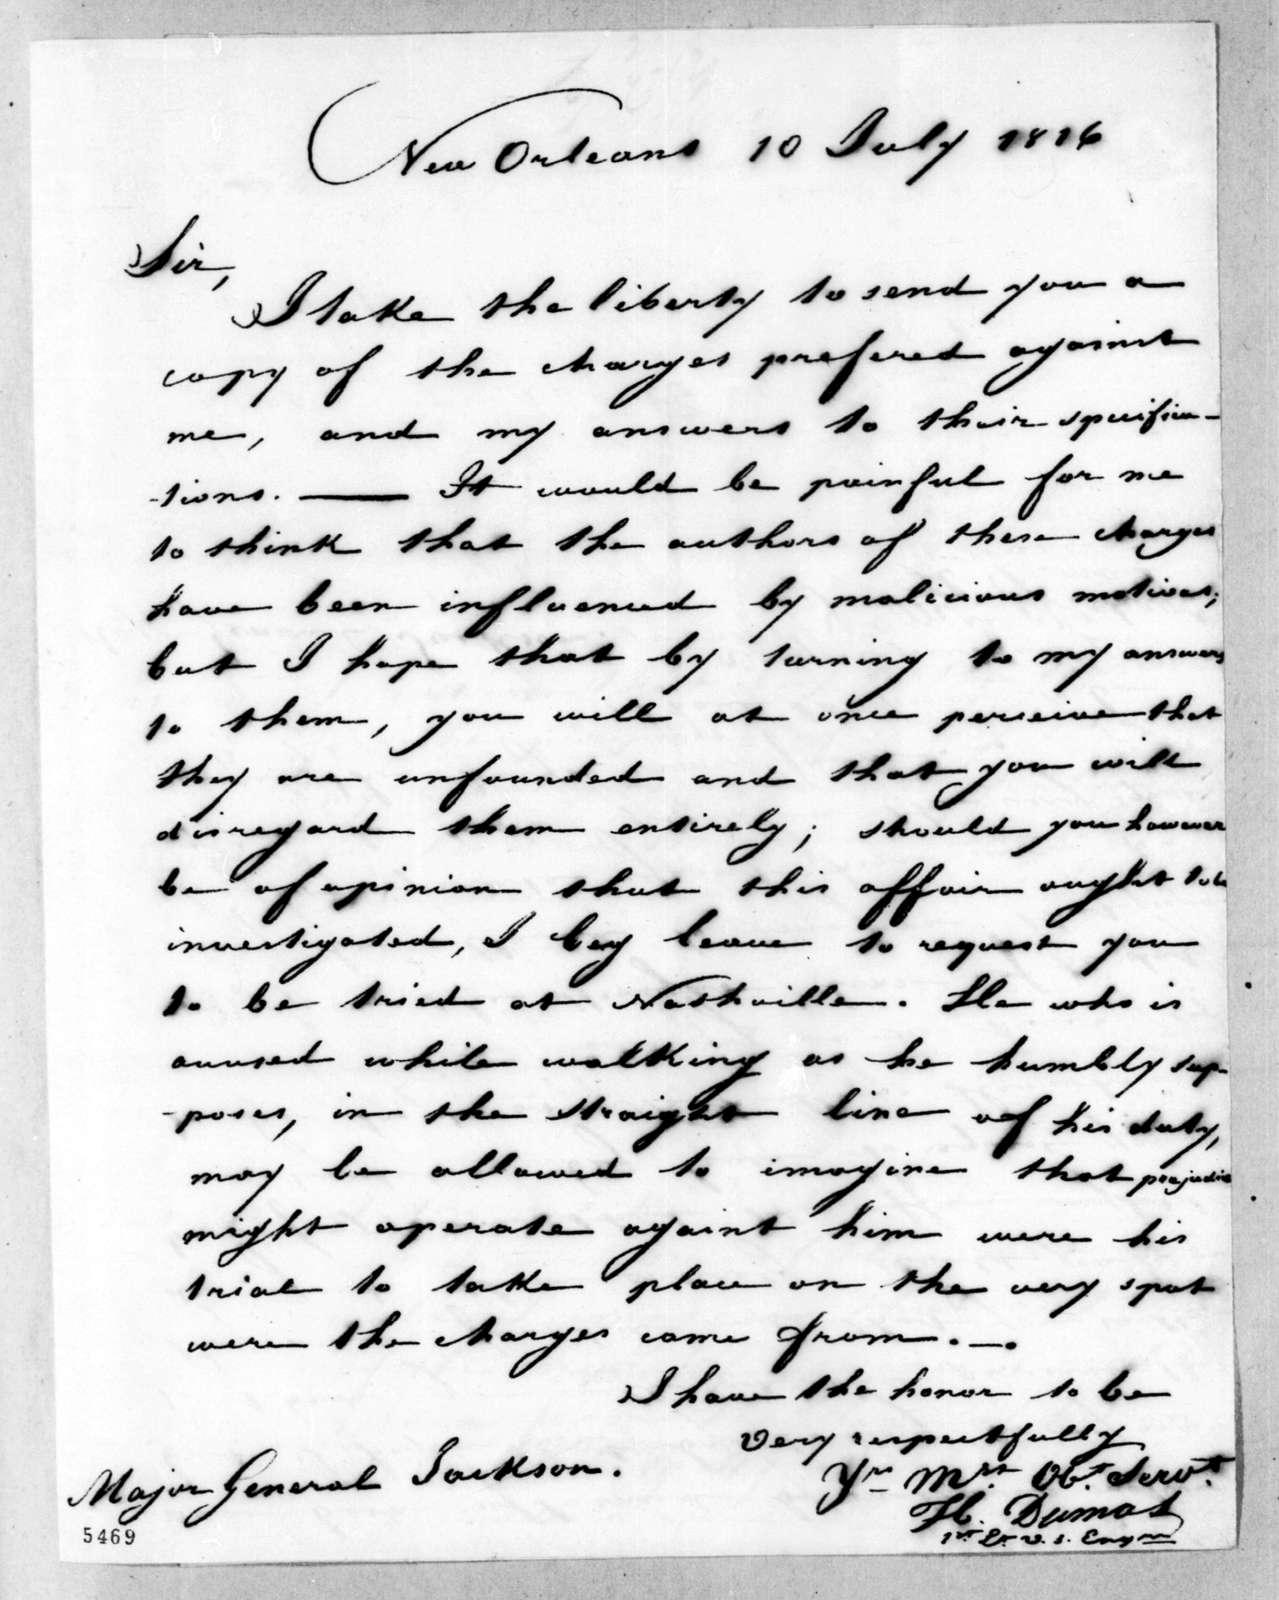 Hypolite Dumas to Andrew Jackson, July 10, 1816